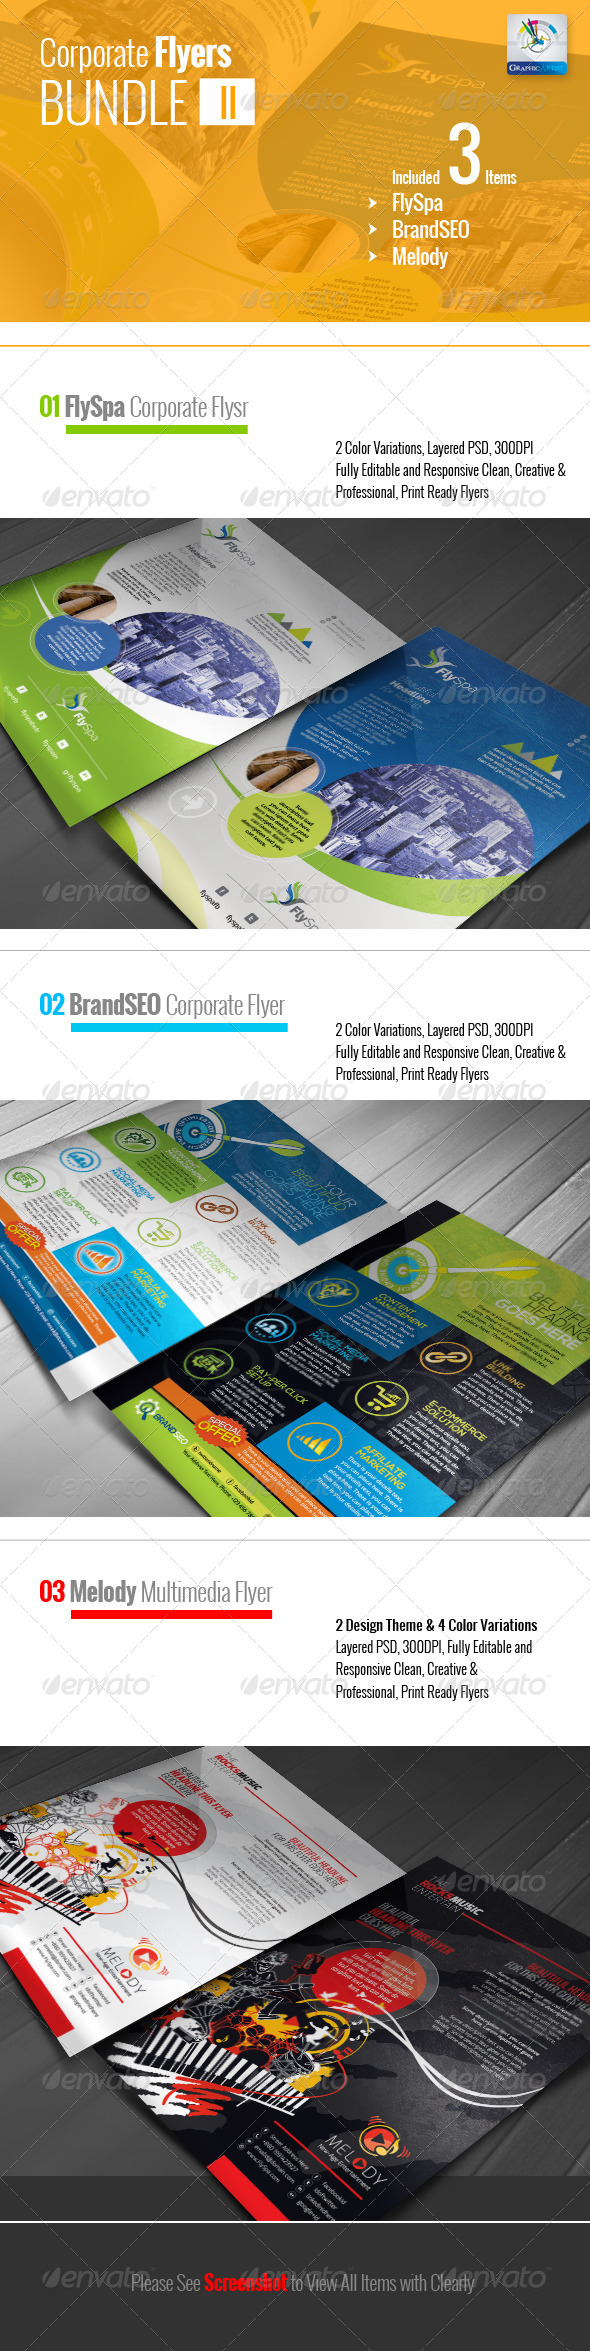 GraphicRiver Corporate Flyer Bundle II 5990370